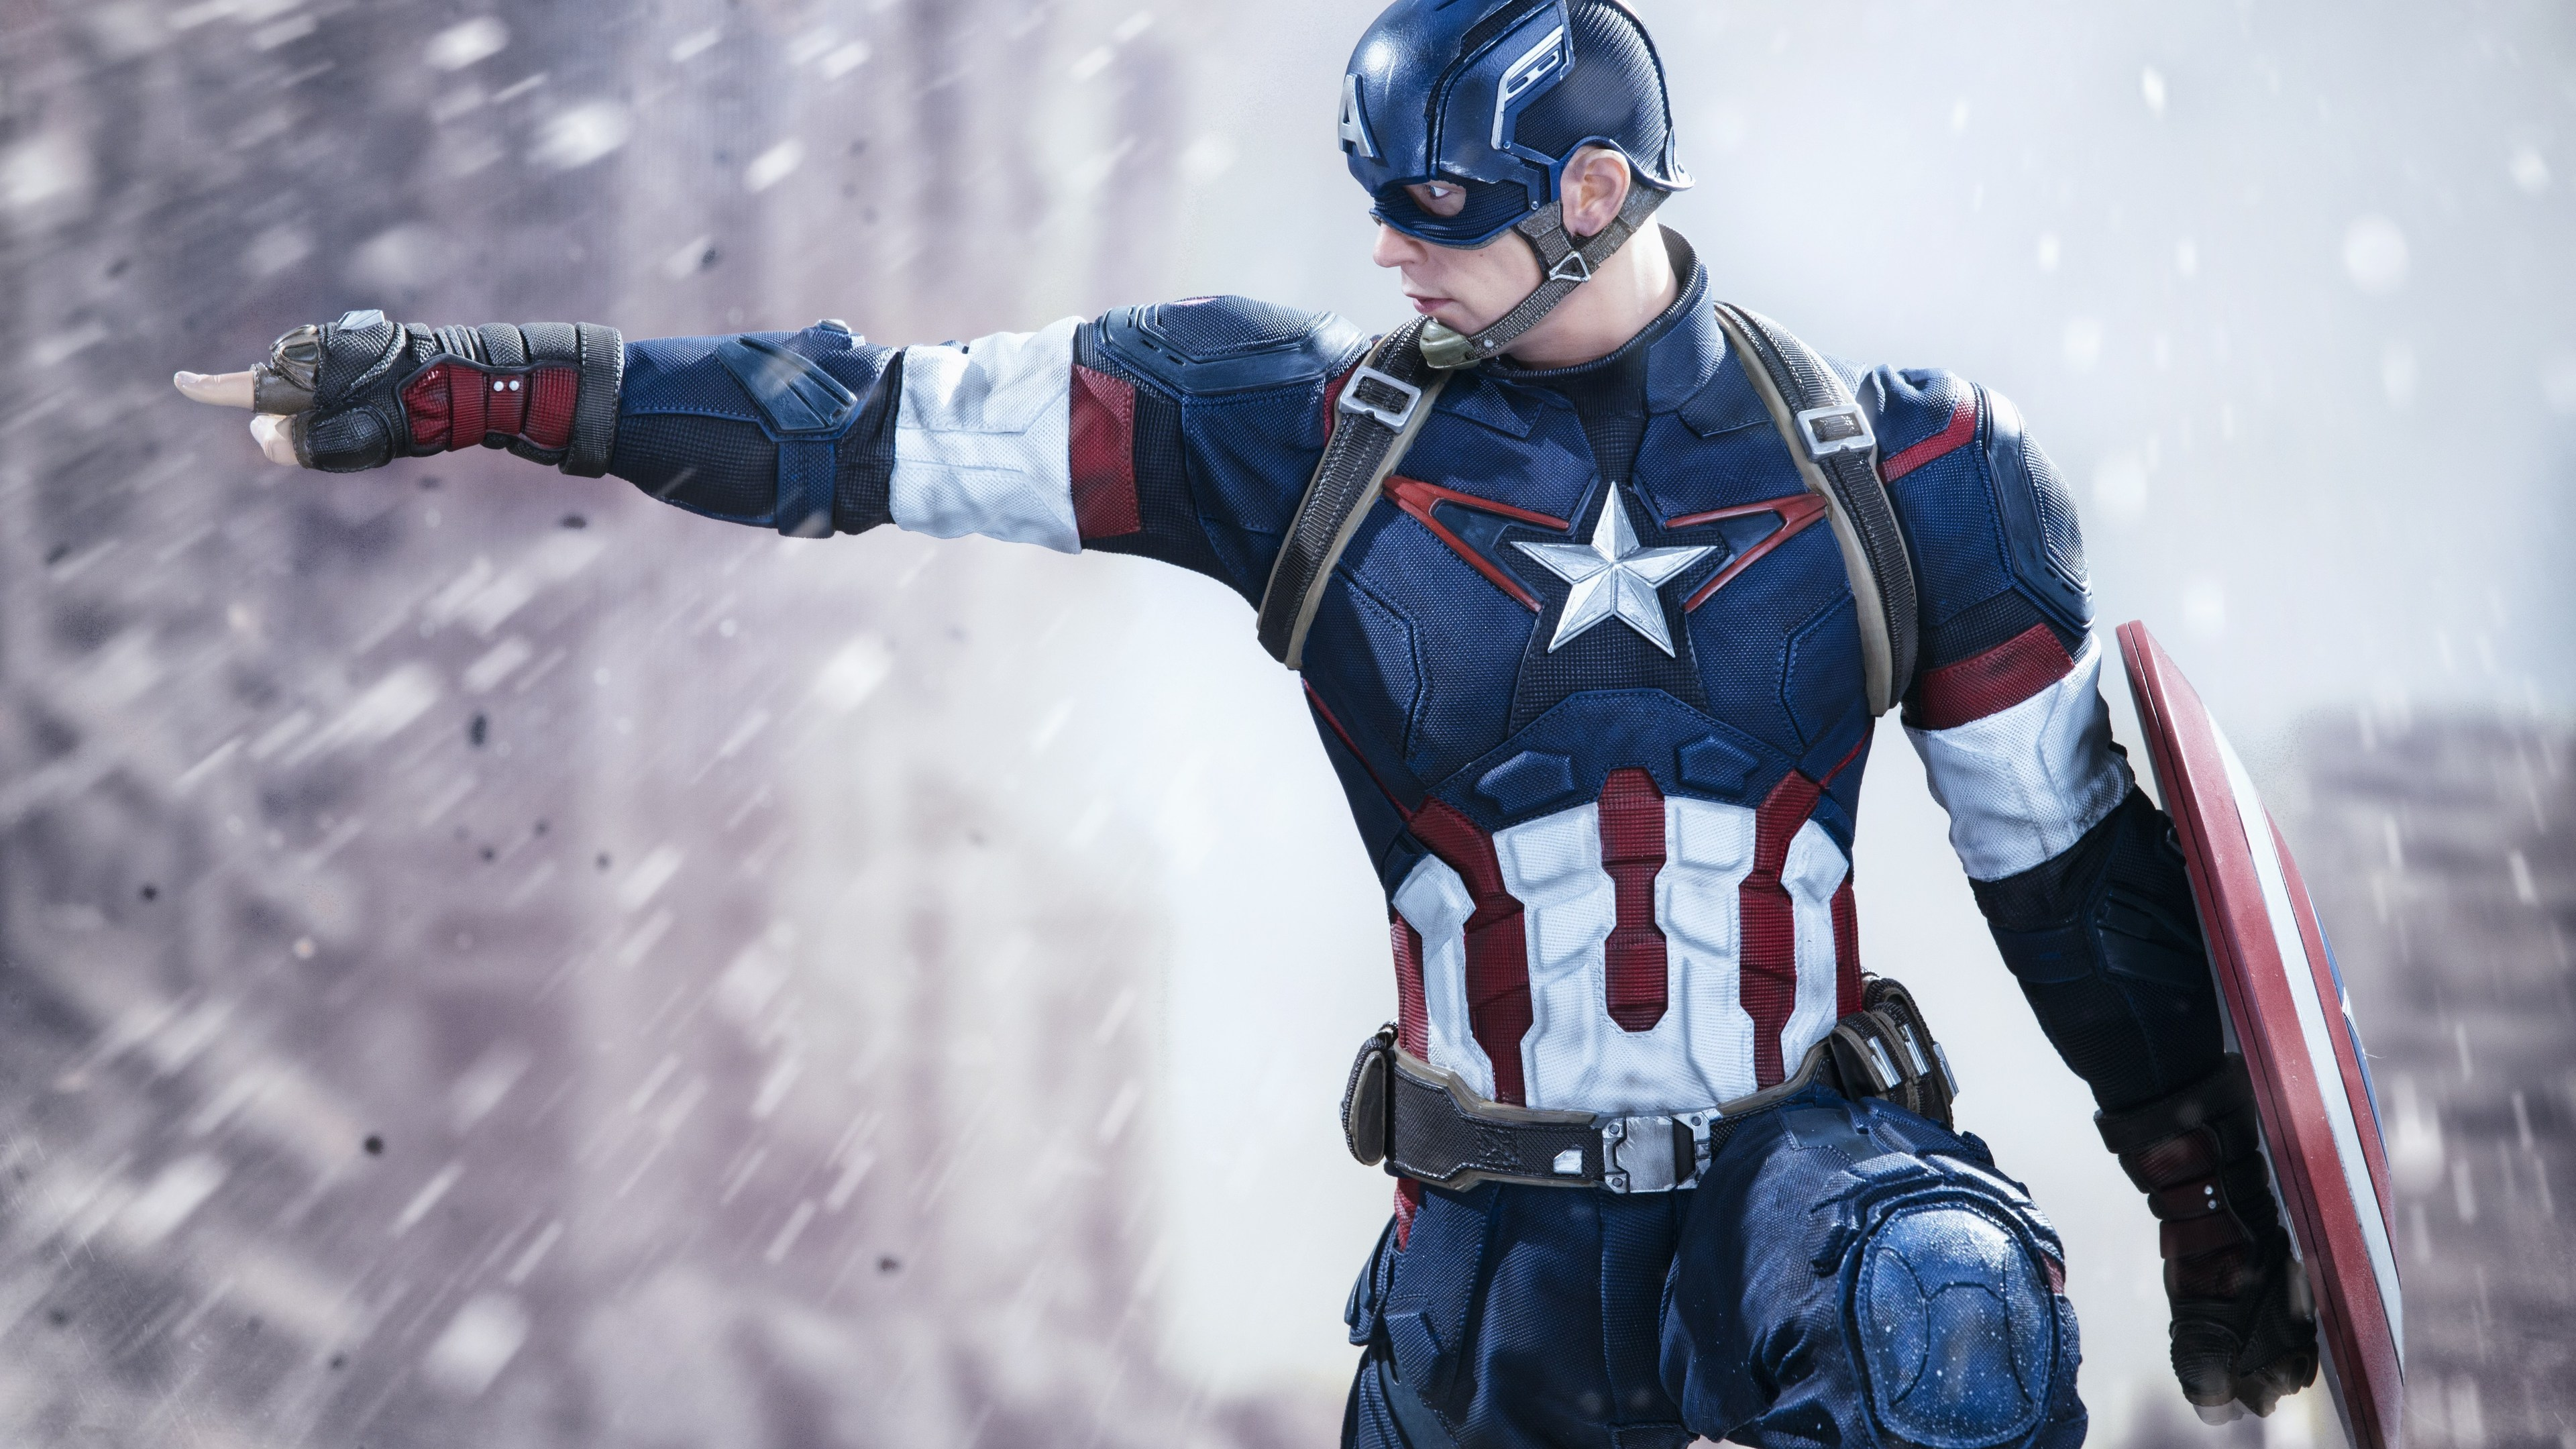 Wallpaper 4k Captain America Civil War New 4k 4k Wallpapers 5k